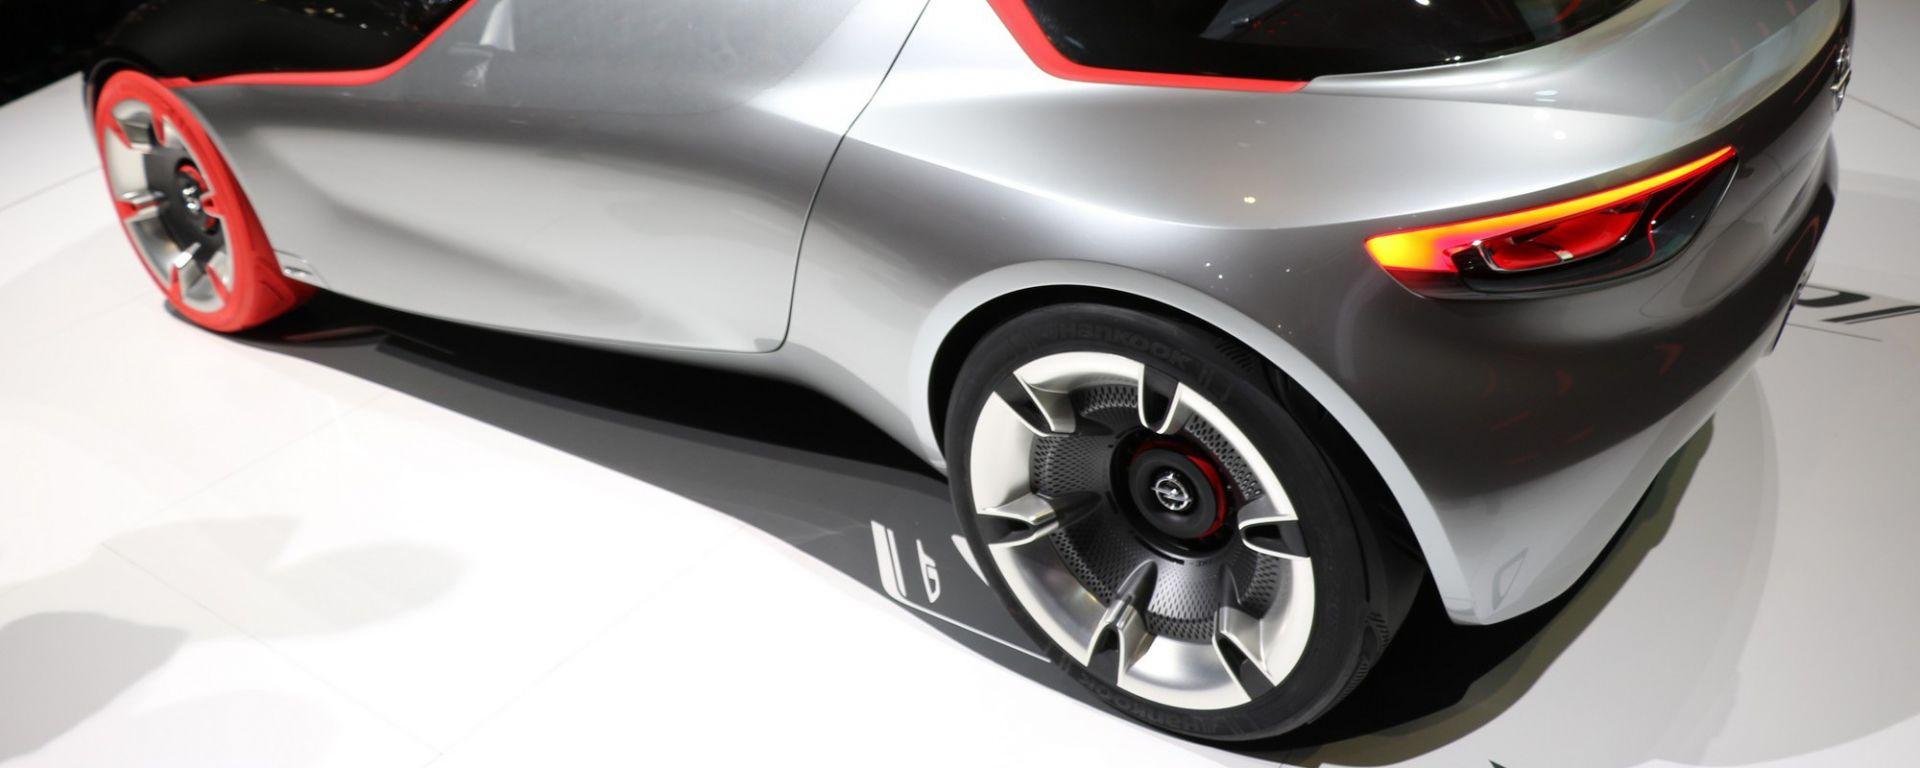 Ginevra 2016 - Notizie dalle Case: Opel